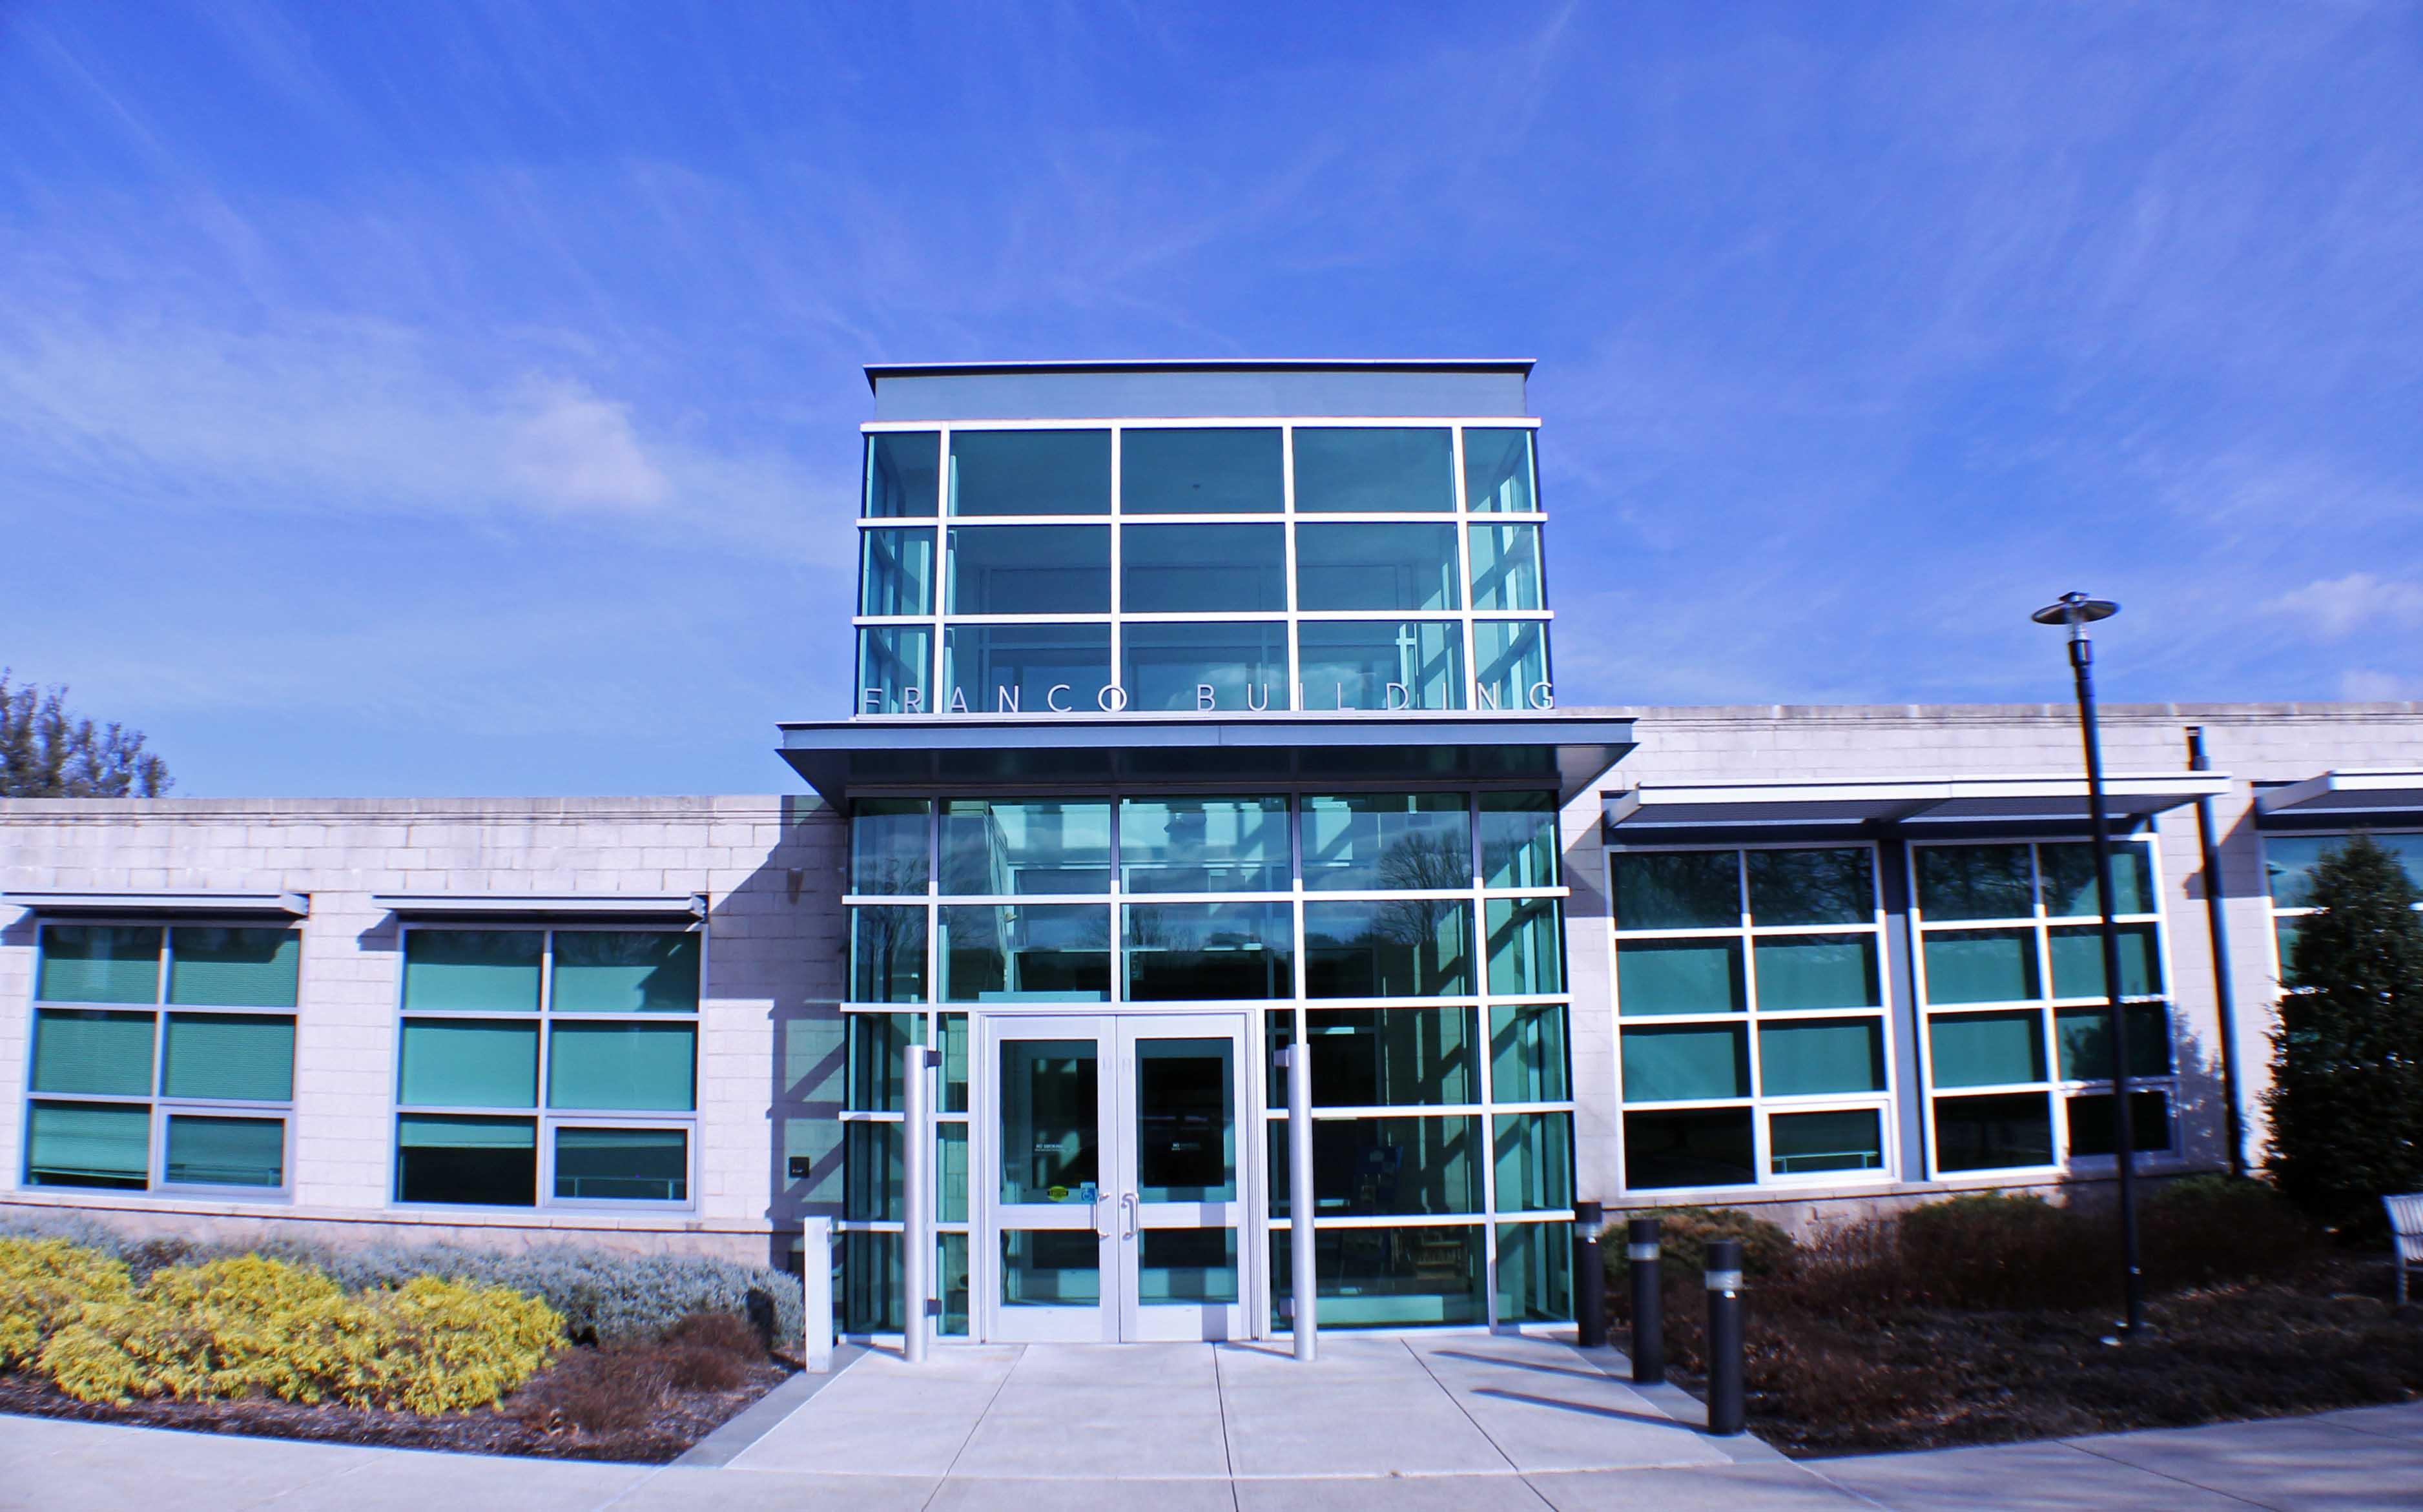 2e892d36b Penn State Berks - Wikipedia